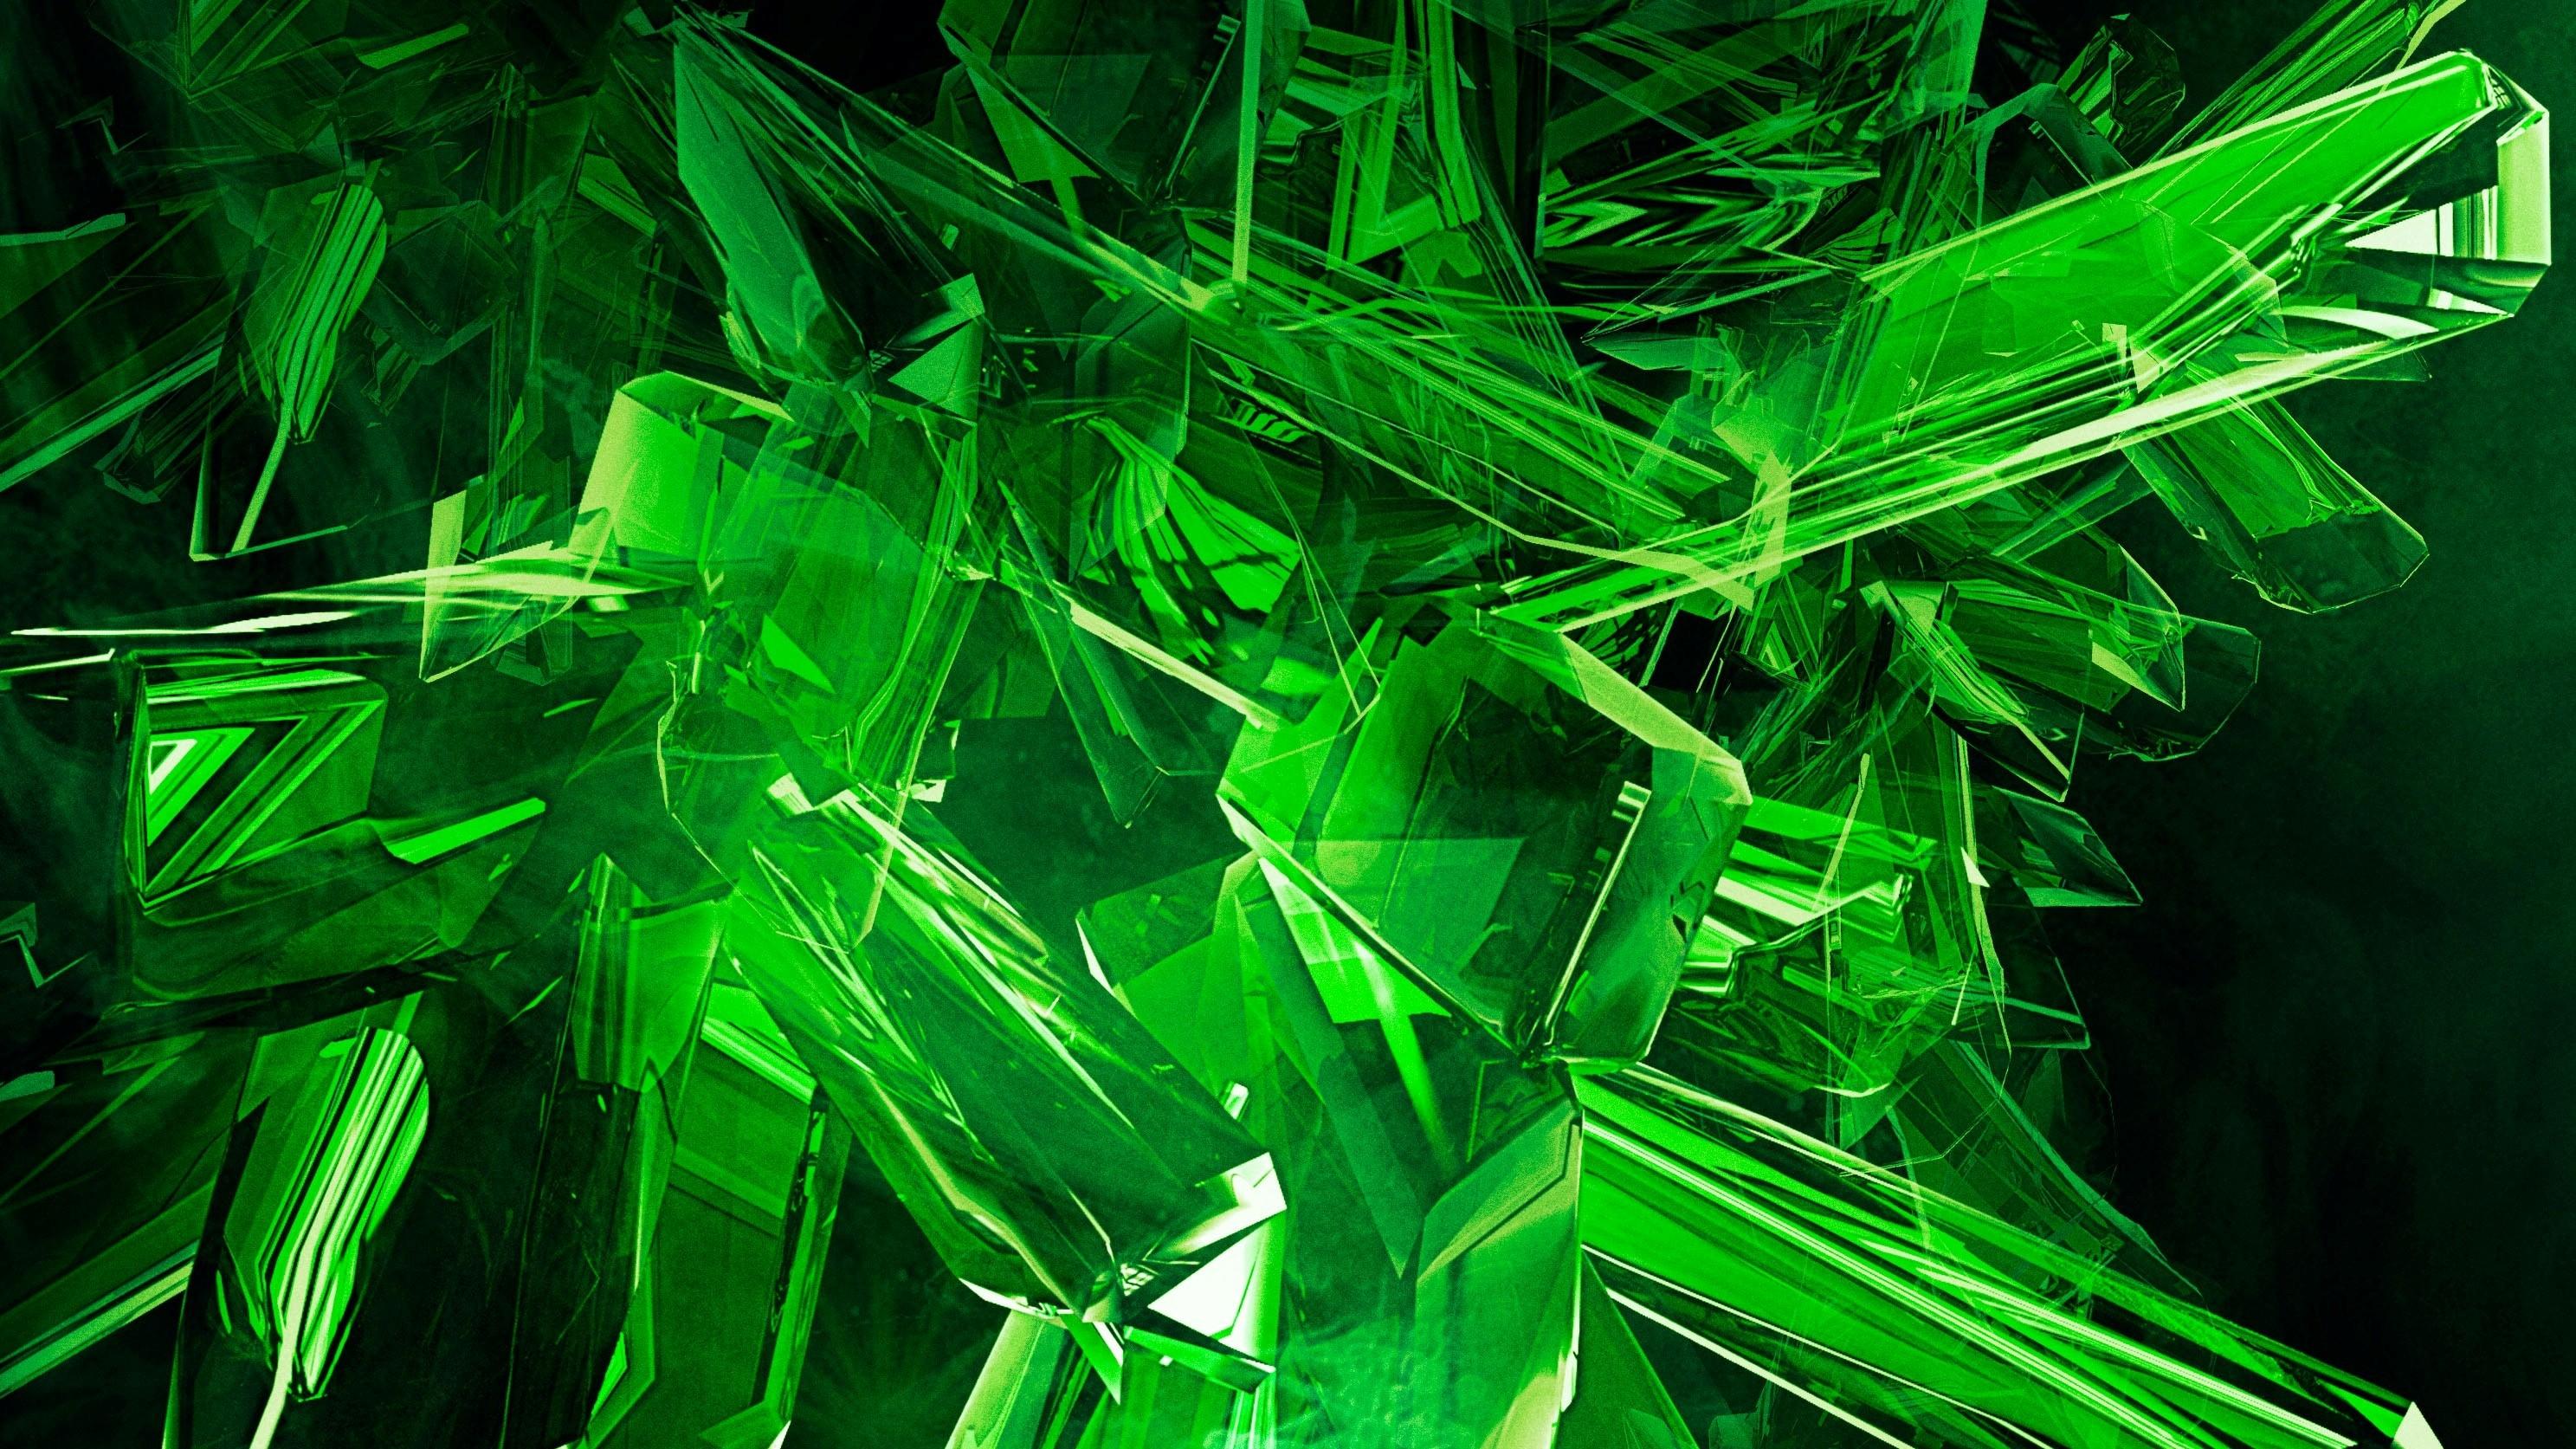 2975x1673 Green Wallpaper Pc Download Beautiful